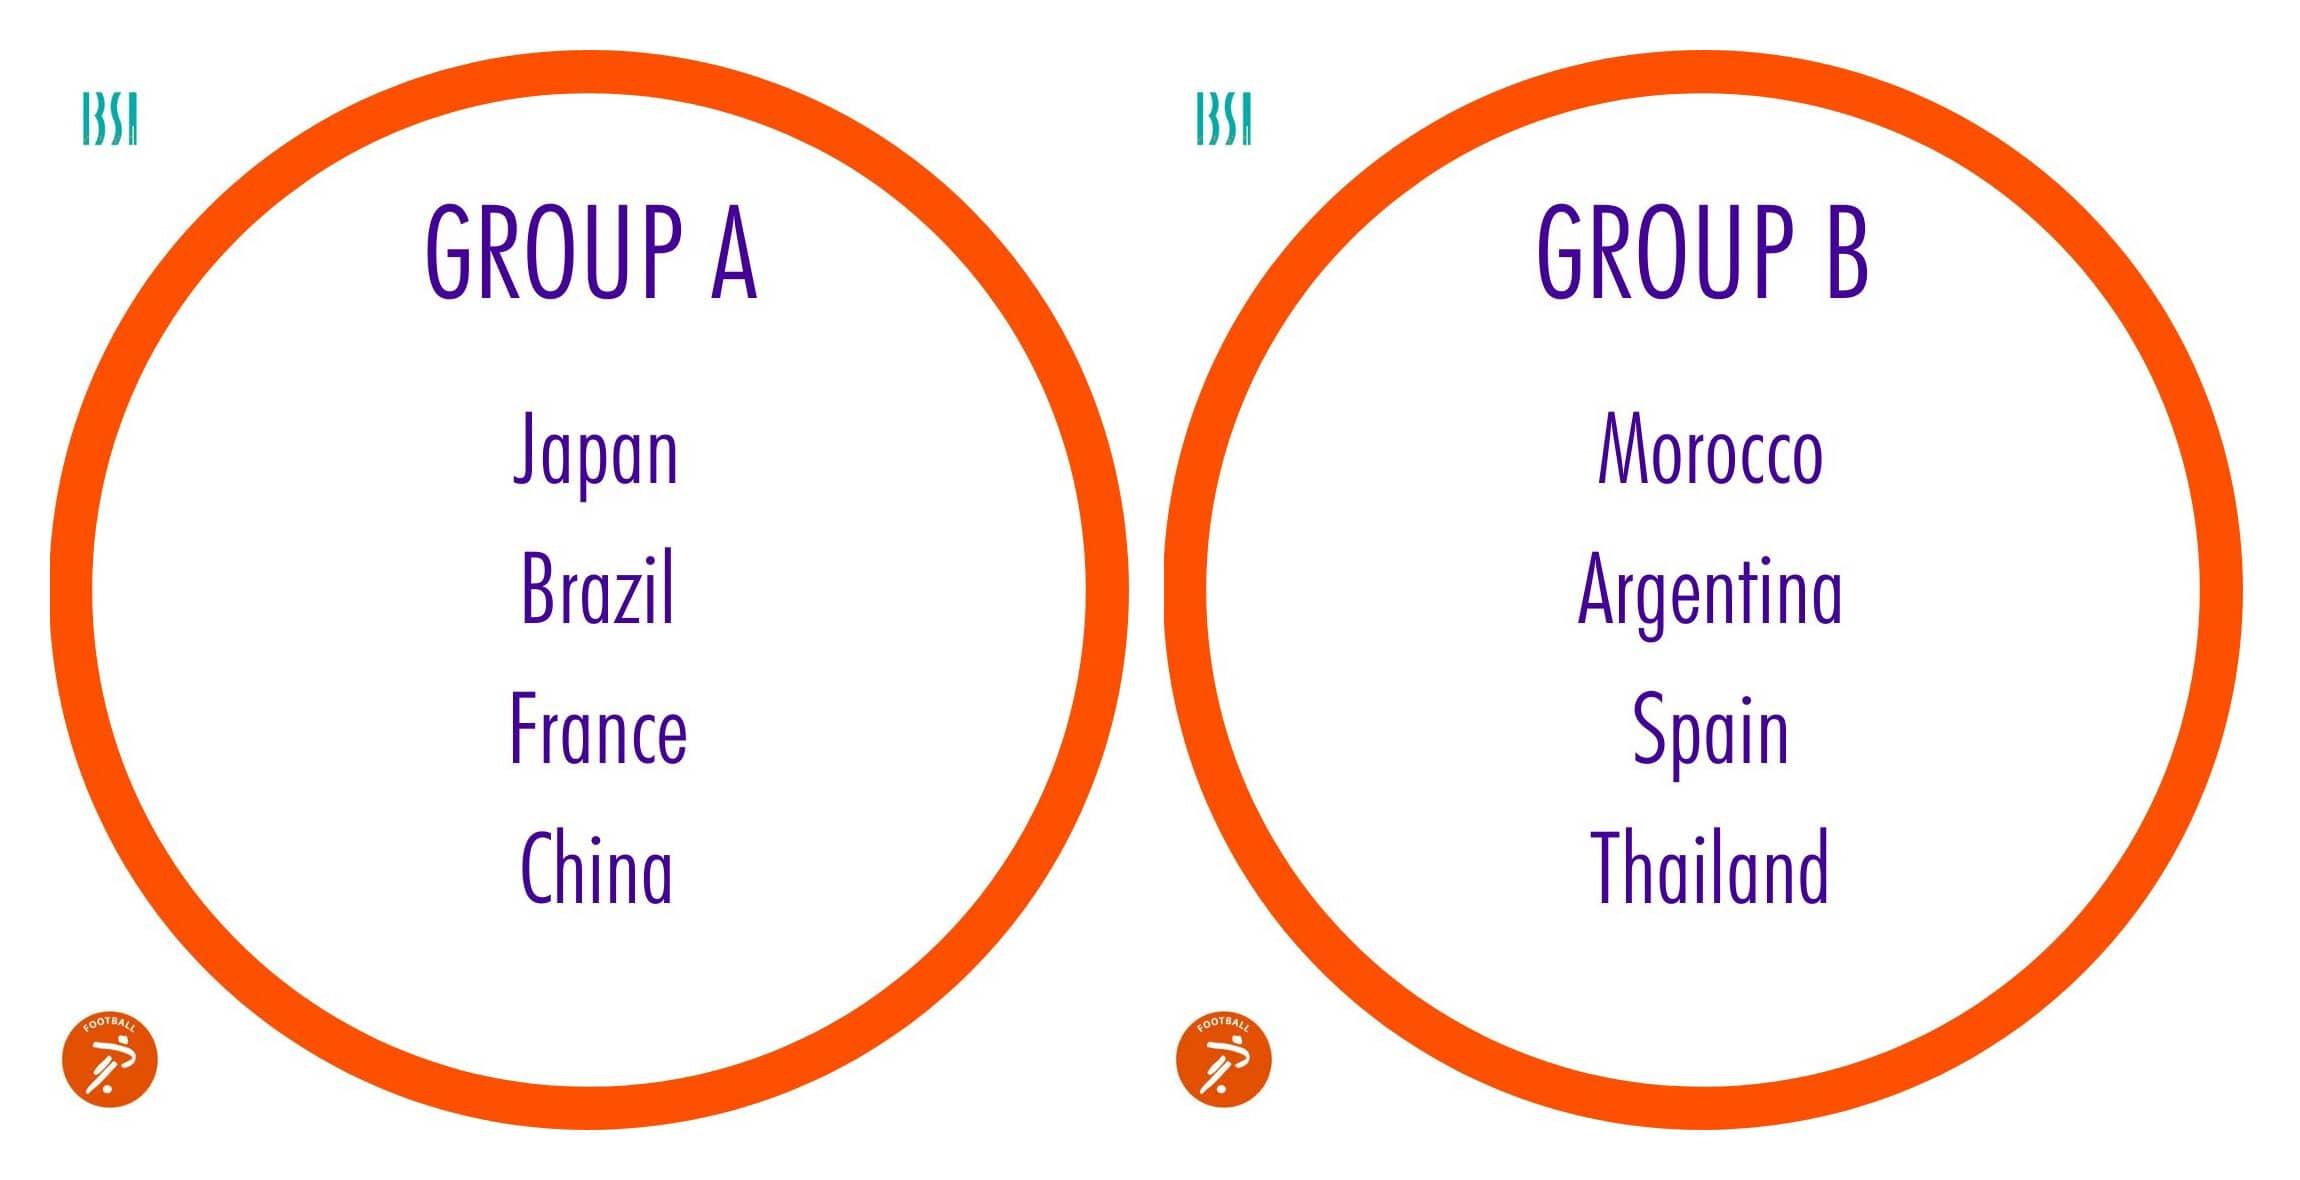 Grupos fútbol sala ciegos Tokio 2020. Fuente: CPE